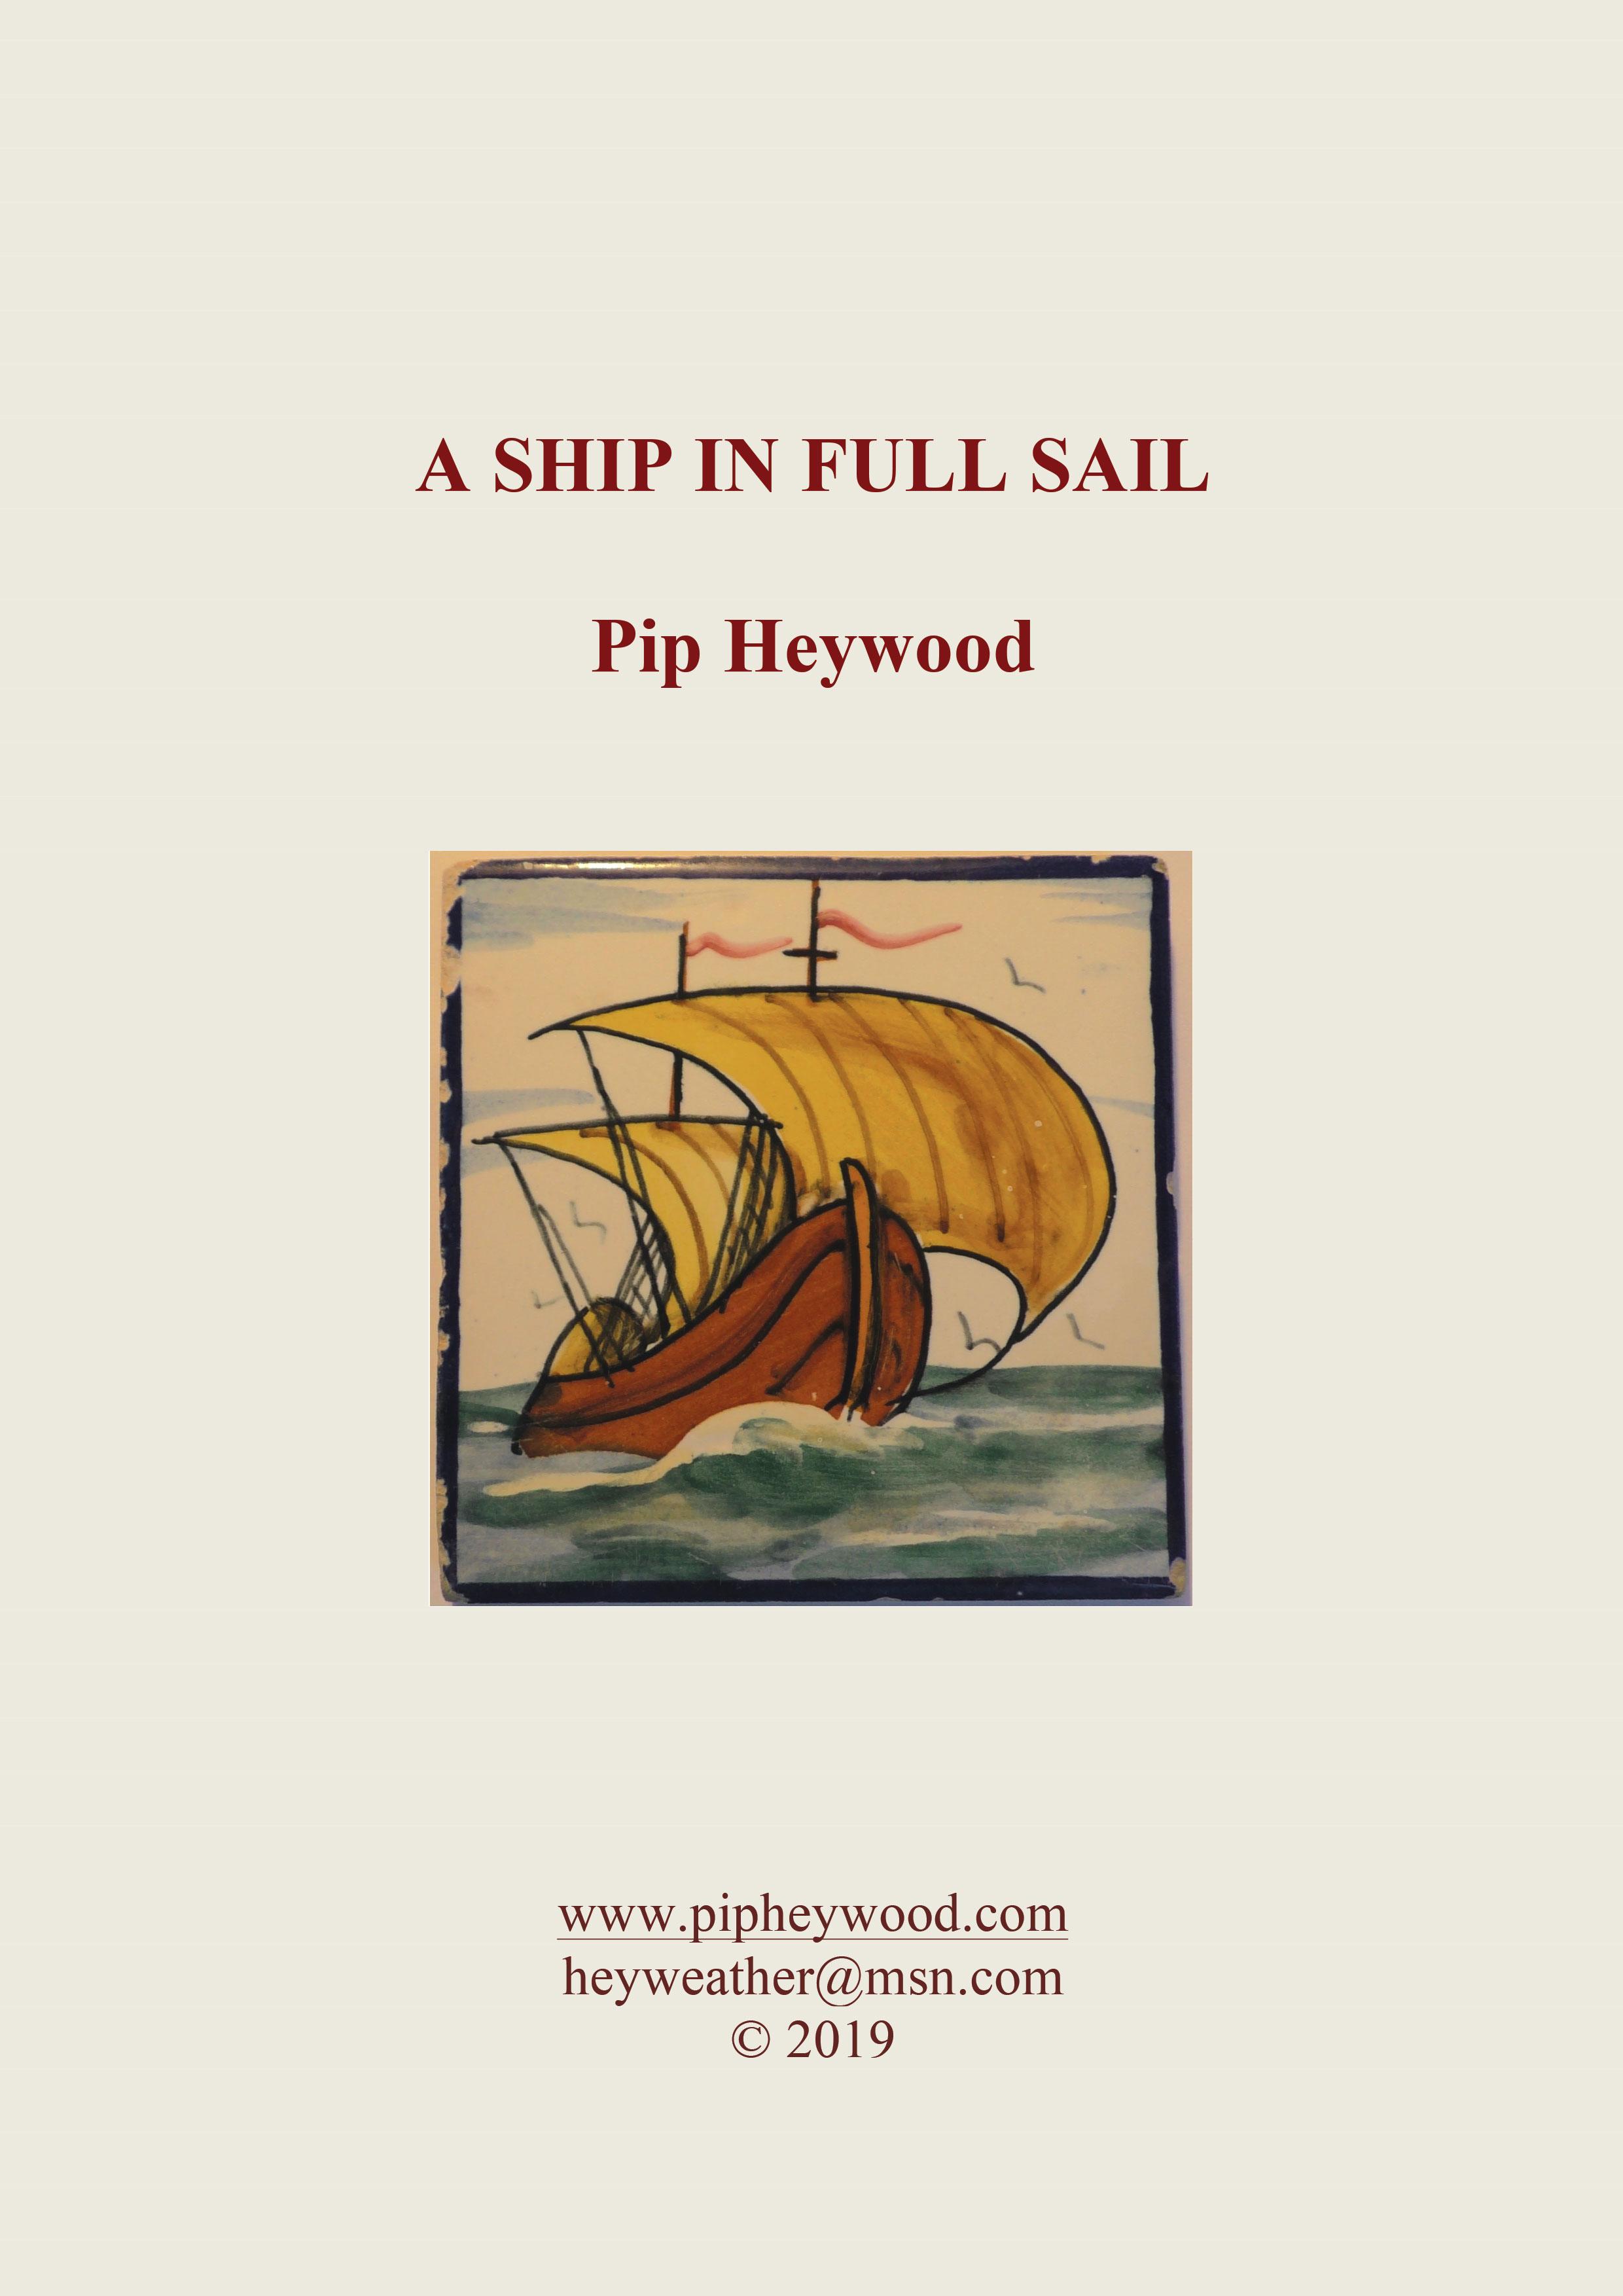 A-ship-in-full-sail.jpg